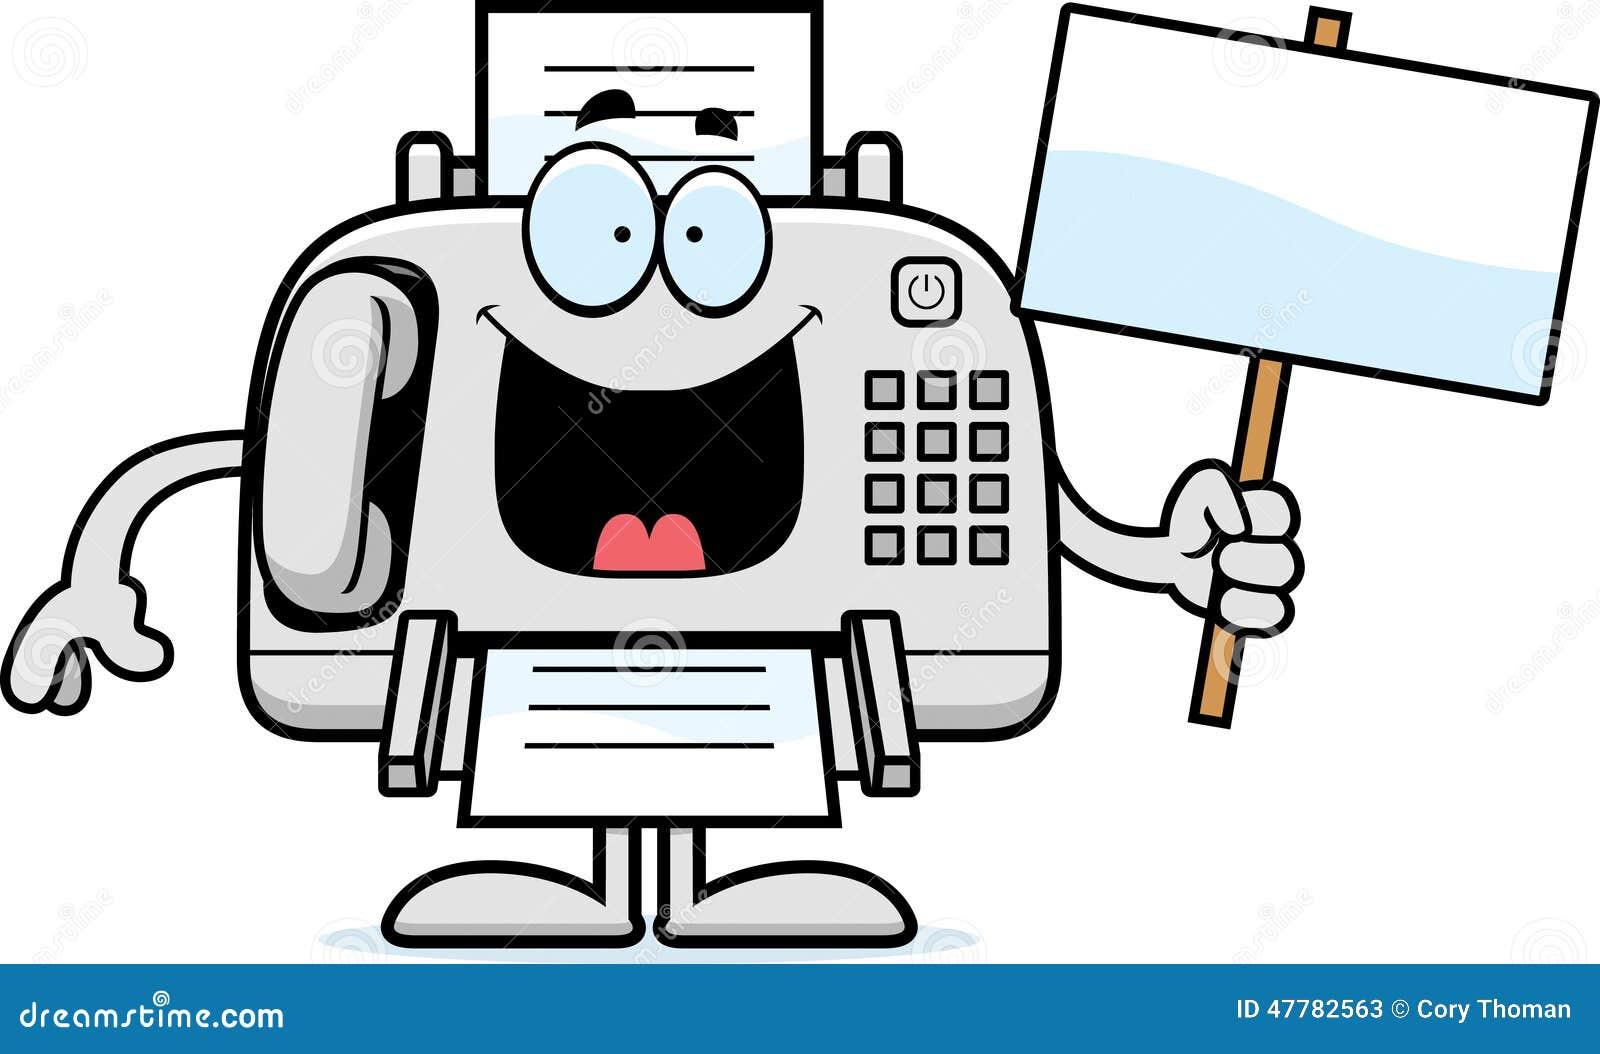 cartoon fax machine sign stock vector